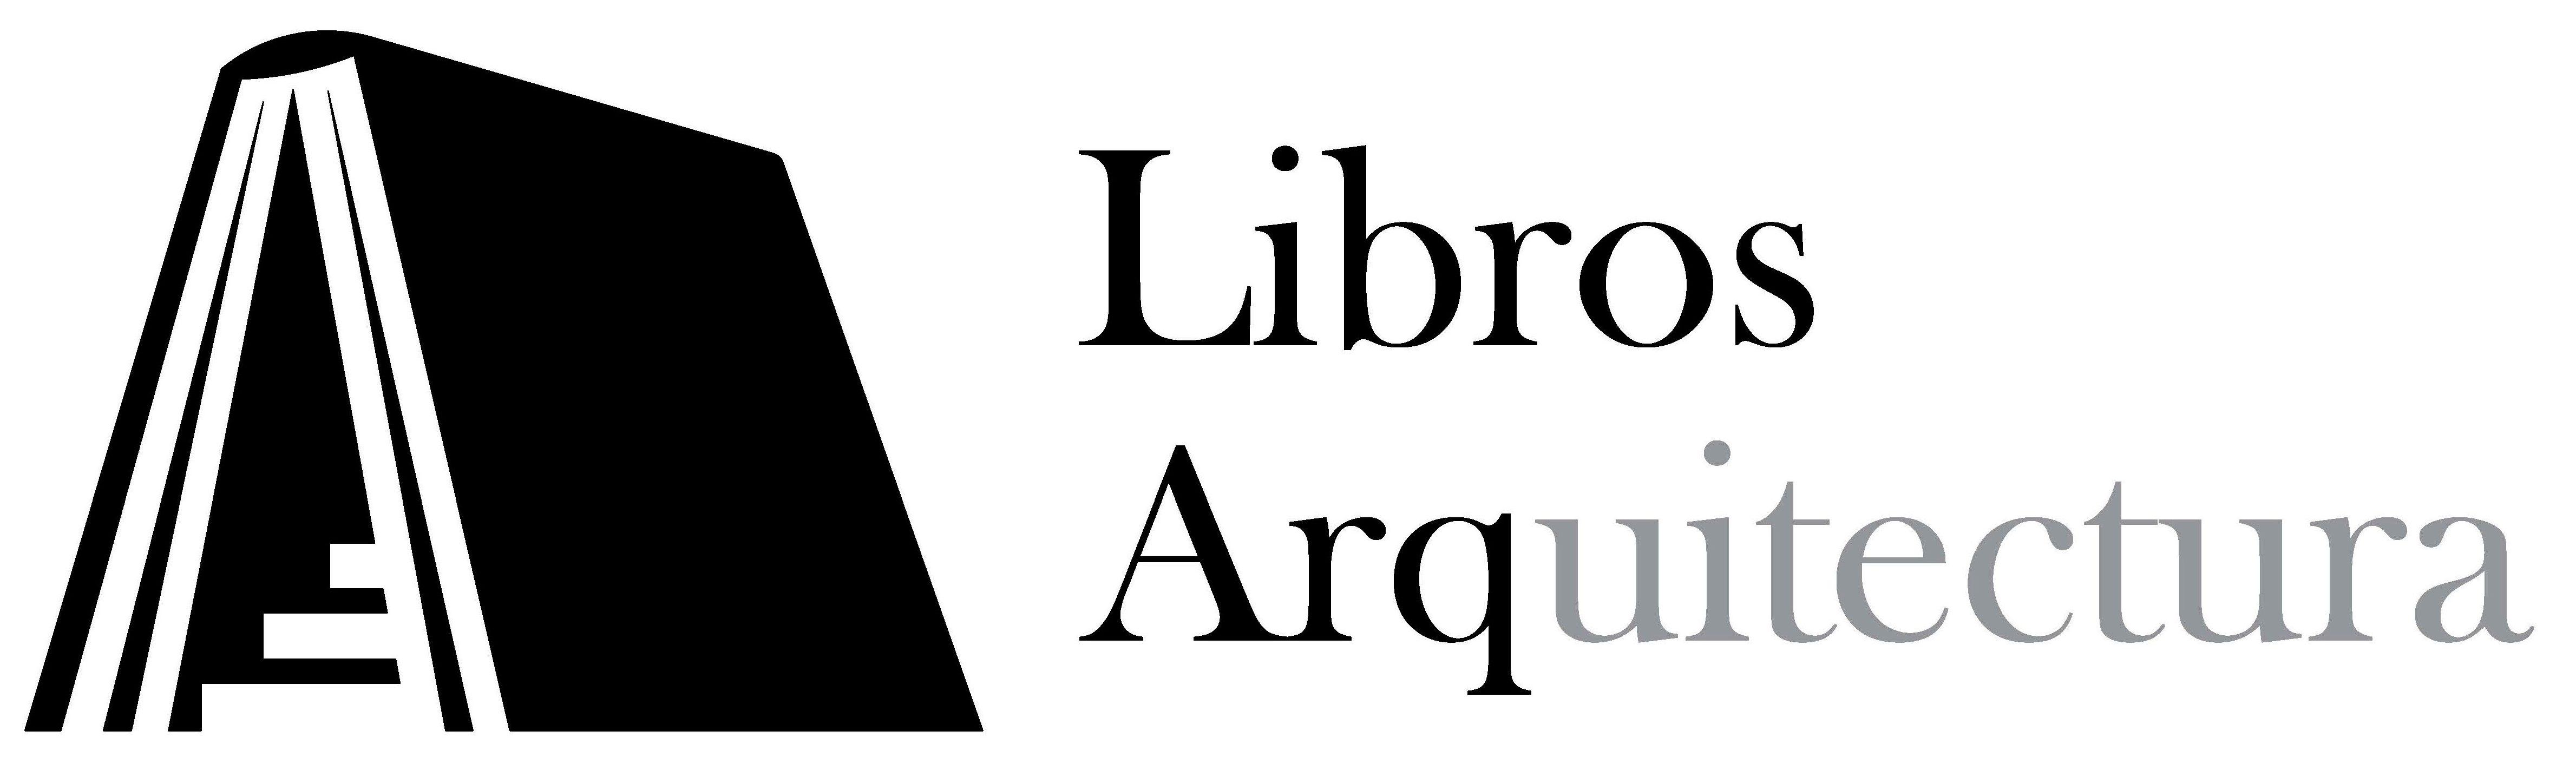 LibrosArq